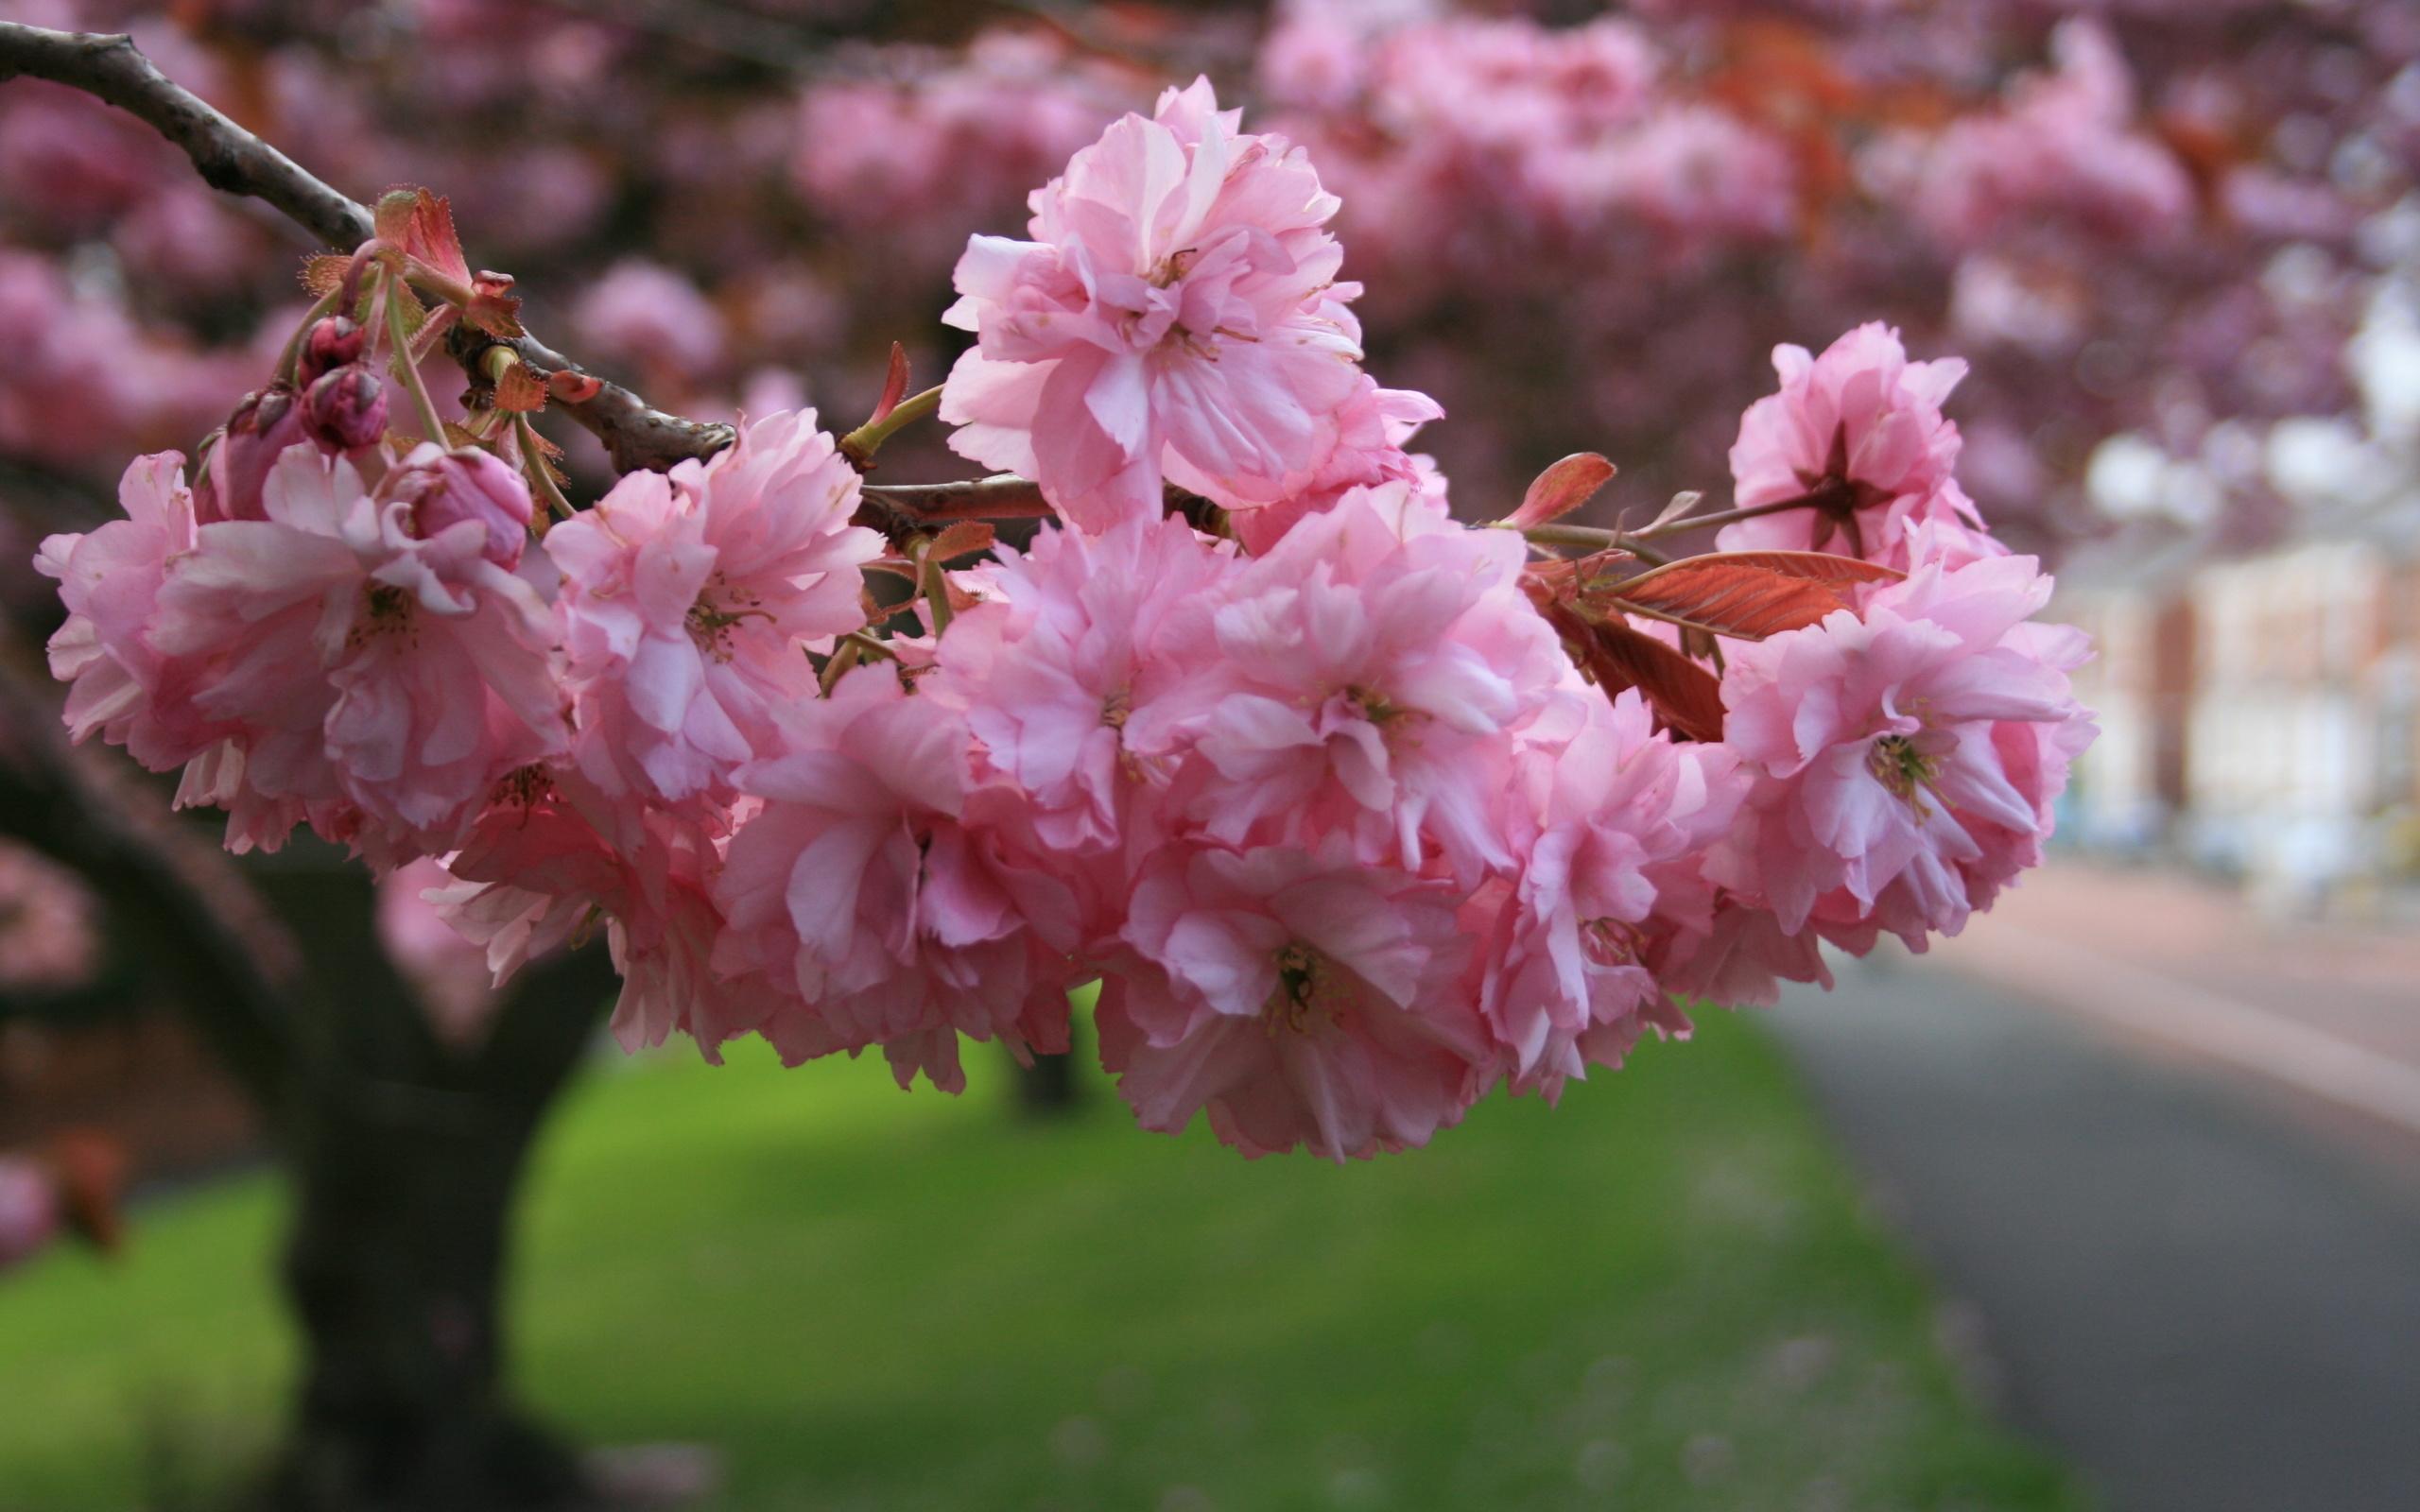 фото овец весна картинки красивые розовые известен как